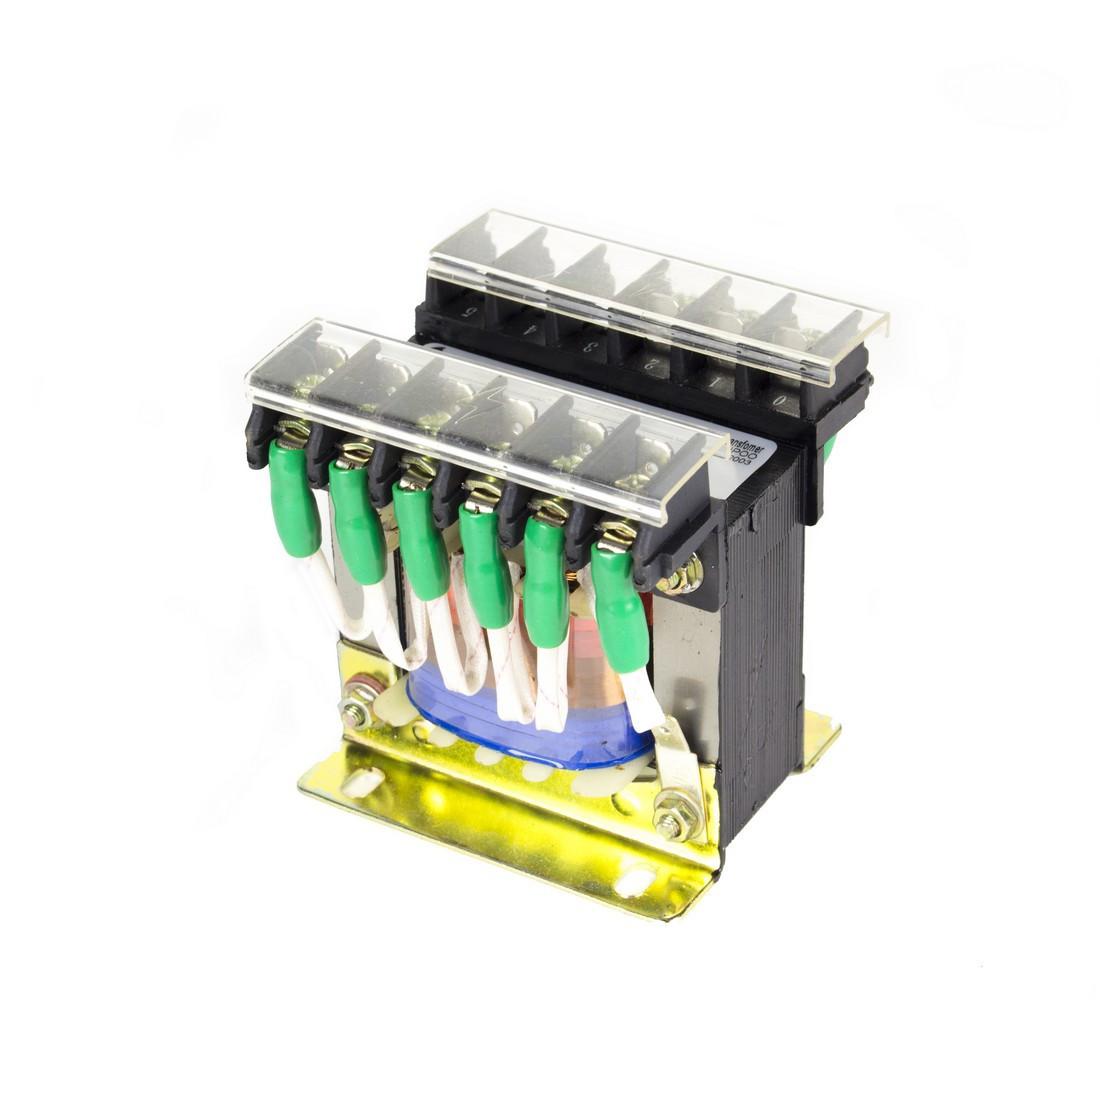 Трансформатор понижающий iPower JBK3-63 VA - фото 1